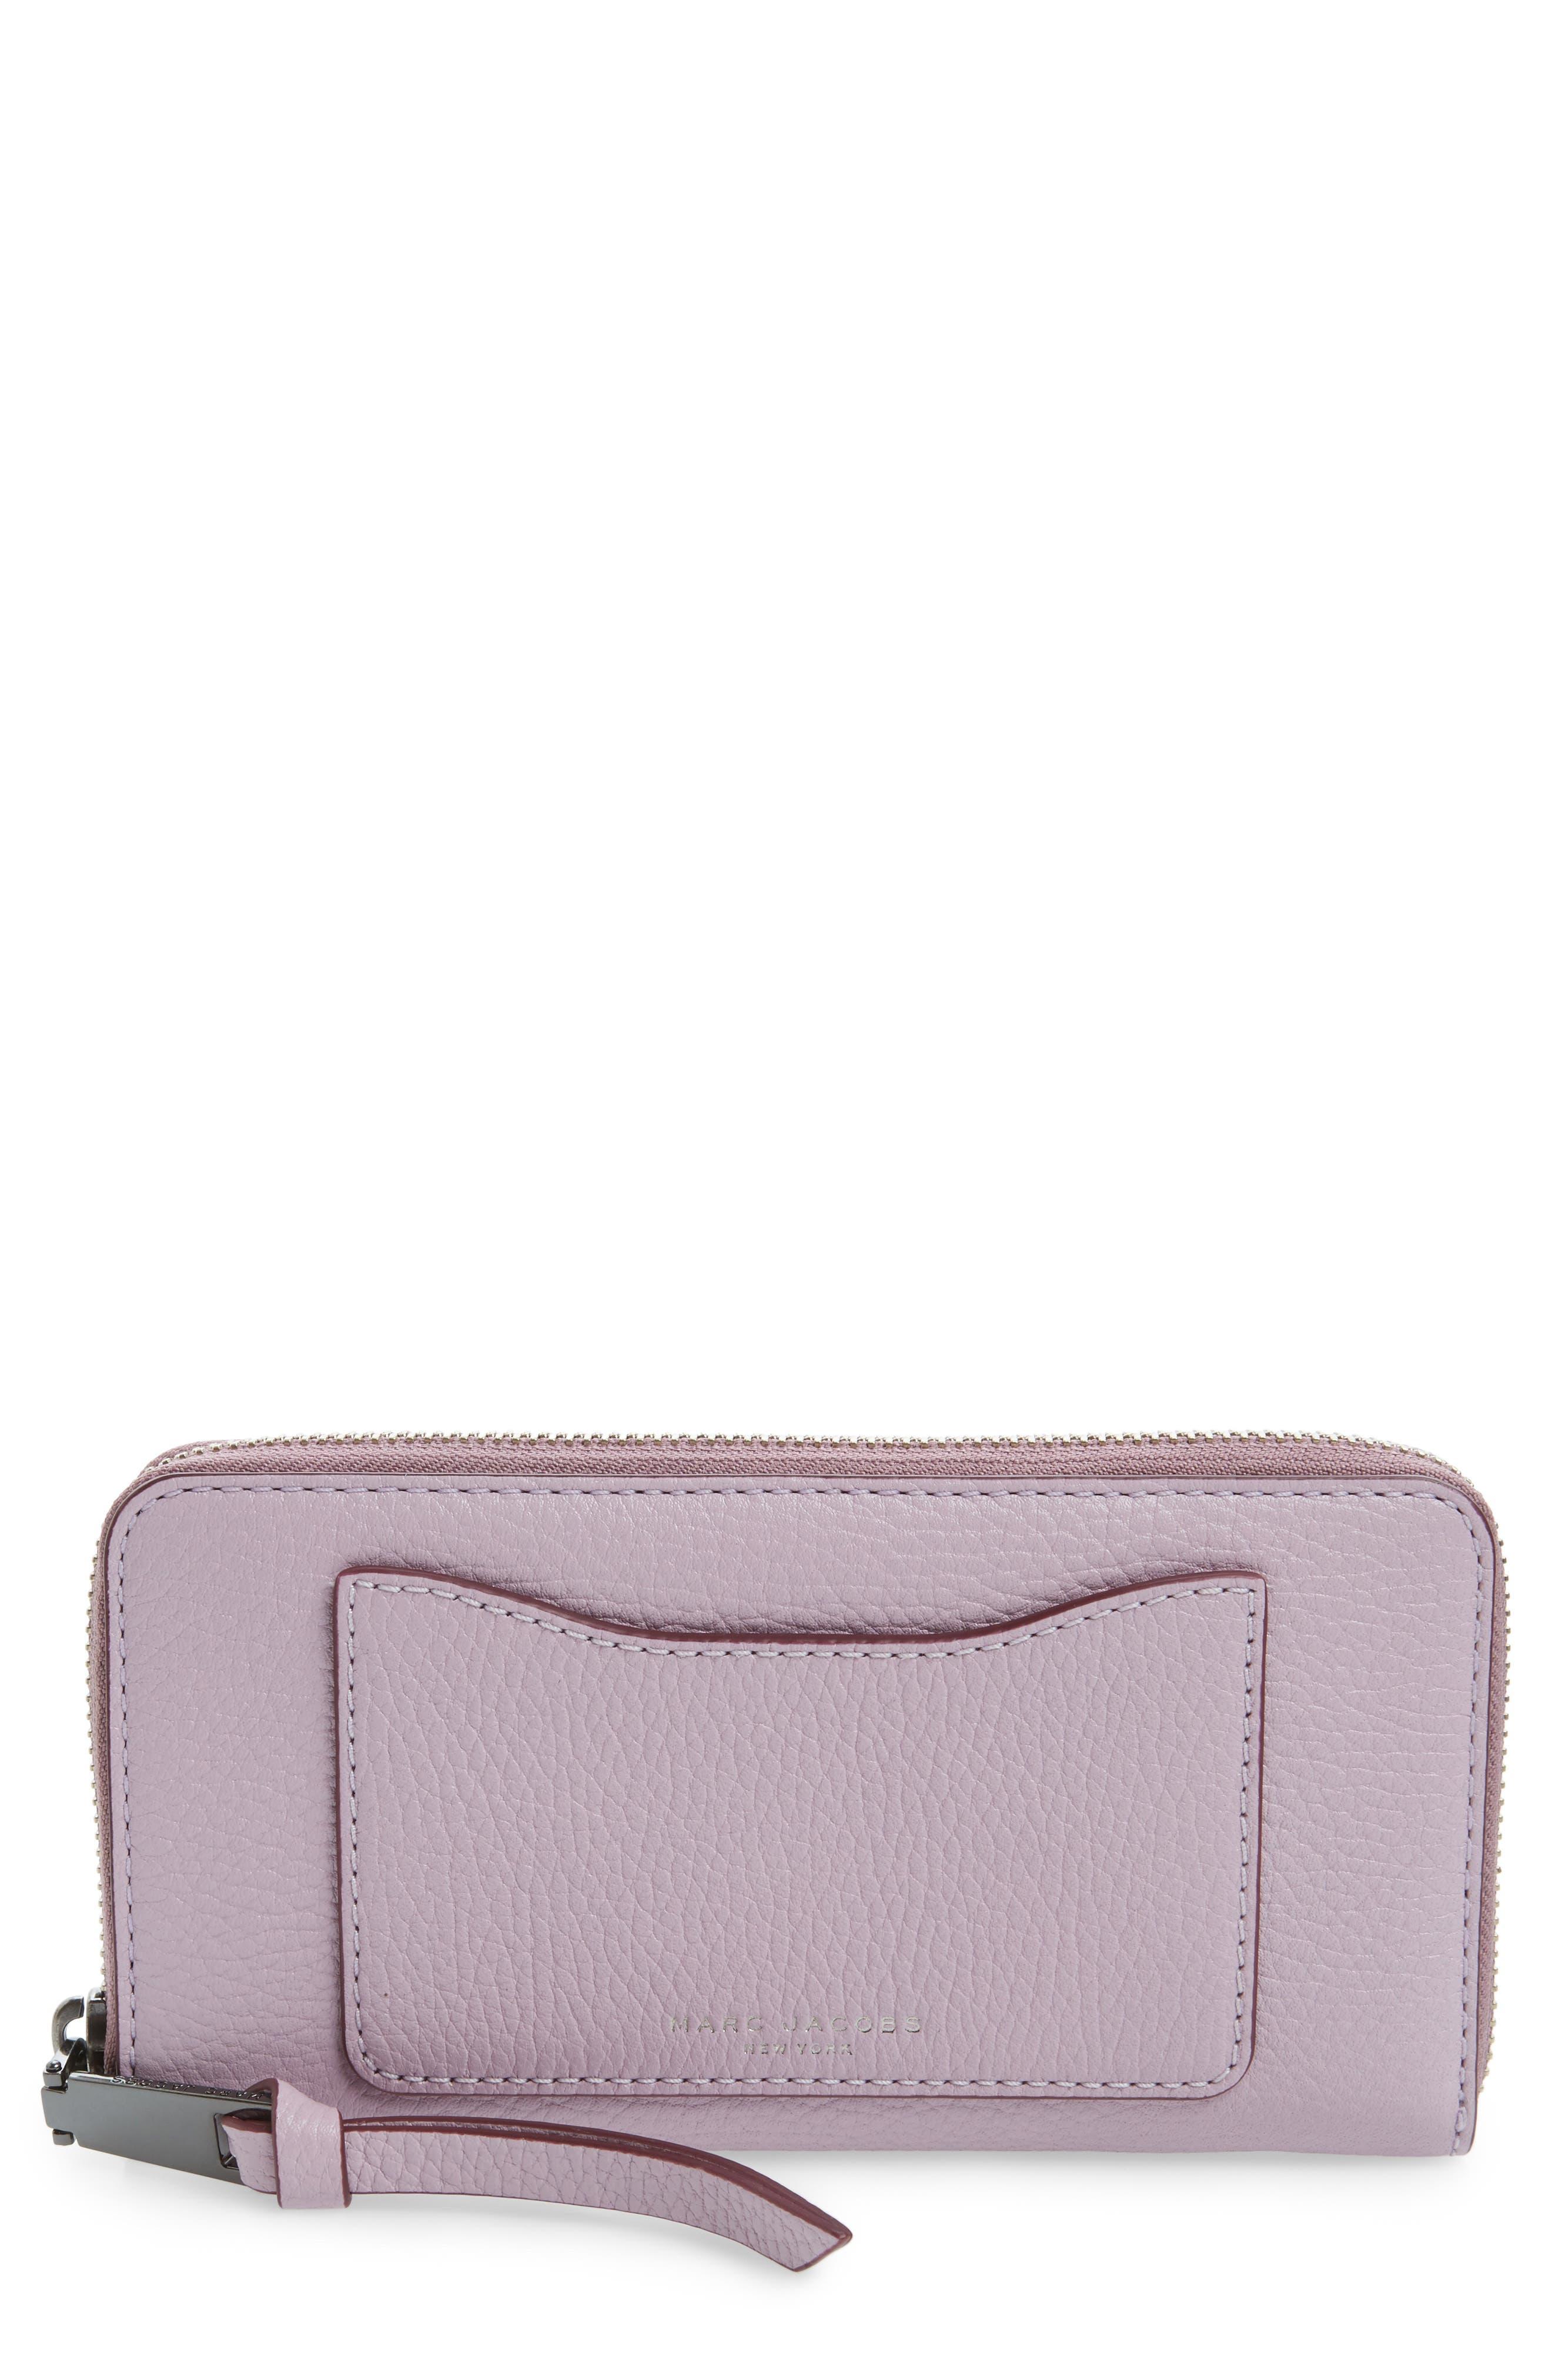 'Recruit Vertical' Leather Wallet,                         Main,                         color, 500